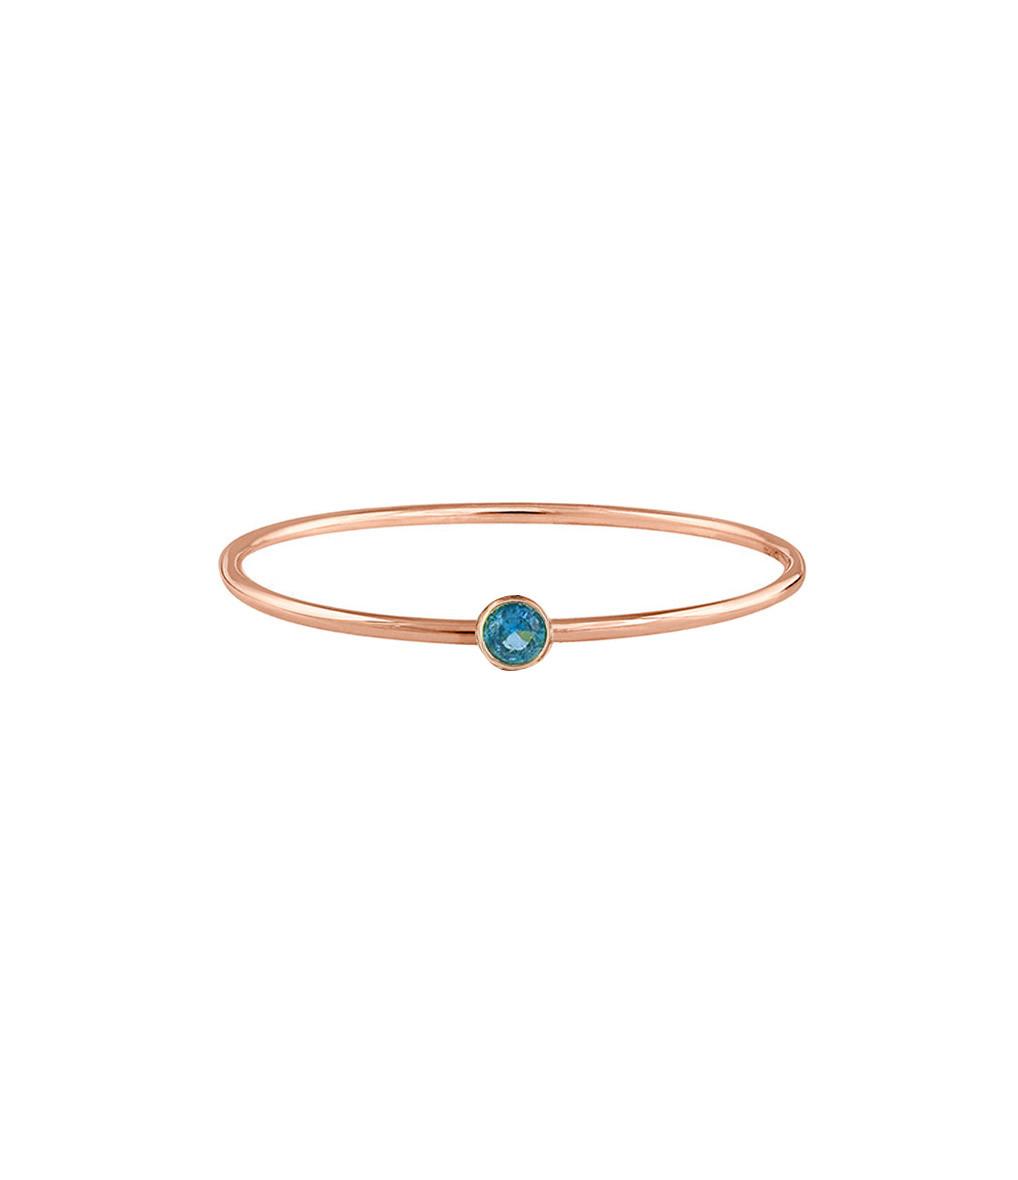 YANNIS SERGAKIS - Bague Caramel Or Diamant Bleu